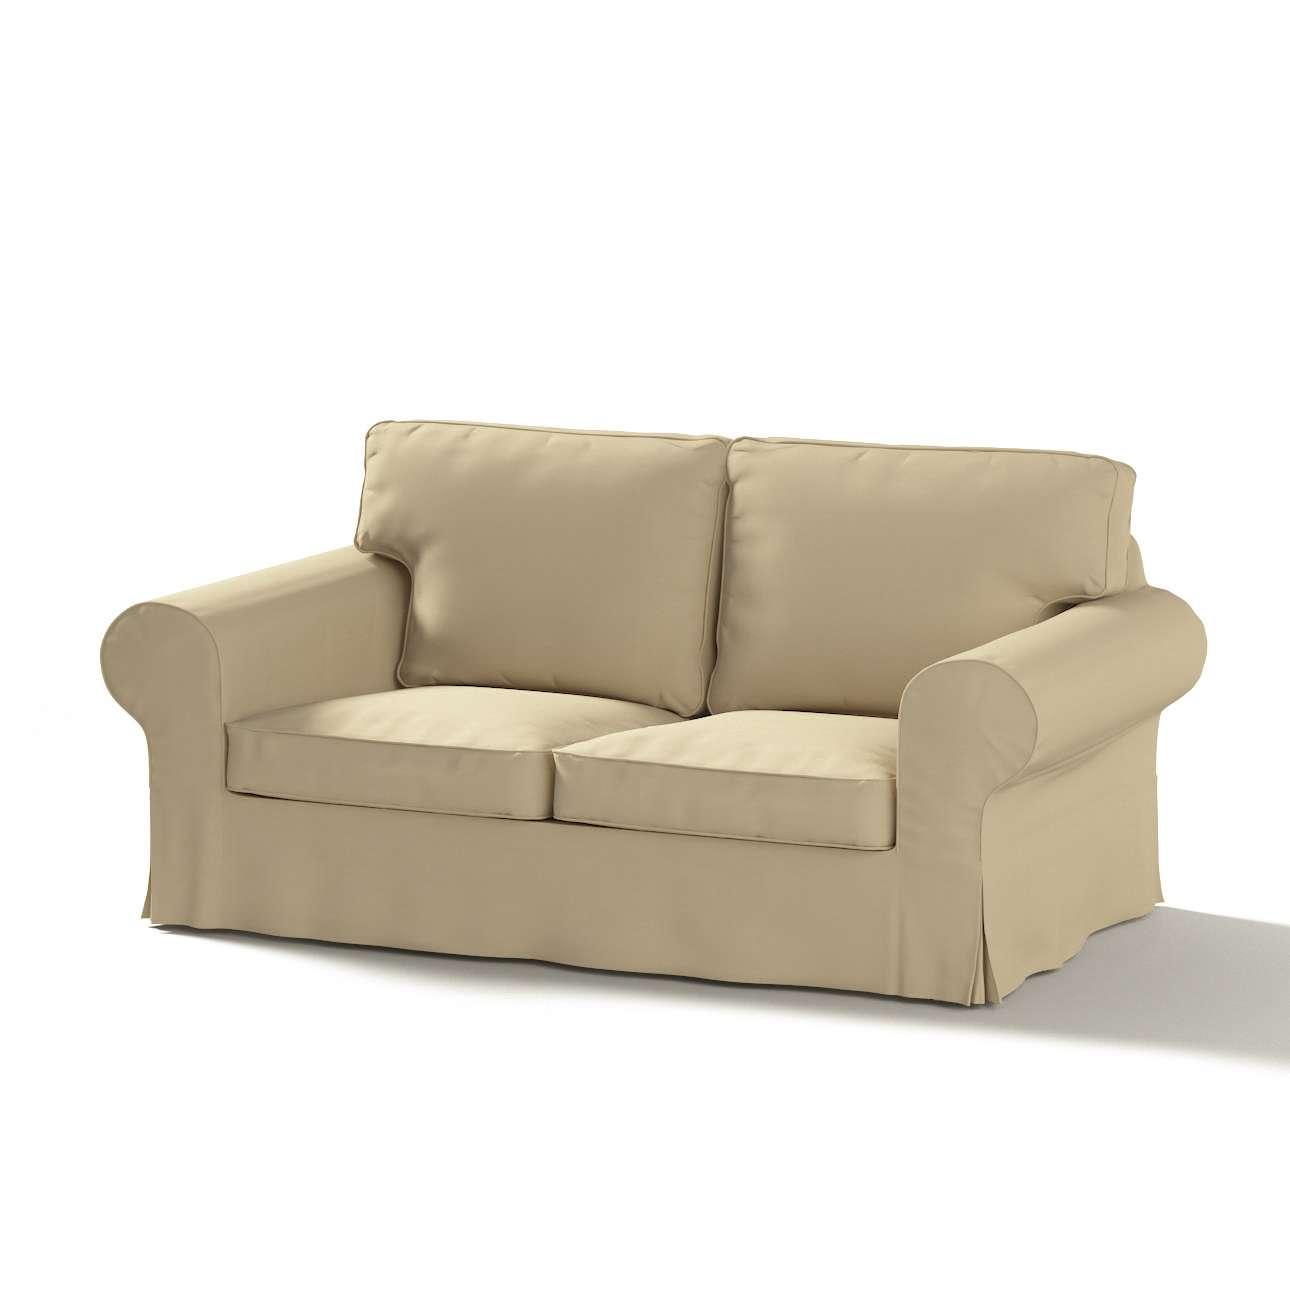 Ektorp betræk 2 sæder sovesofa gammel model<br/>Bredde ca 195cm fra kollektionen Cotton Panama, Stof: 702-01